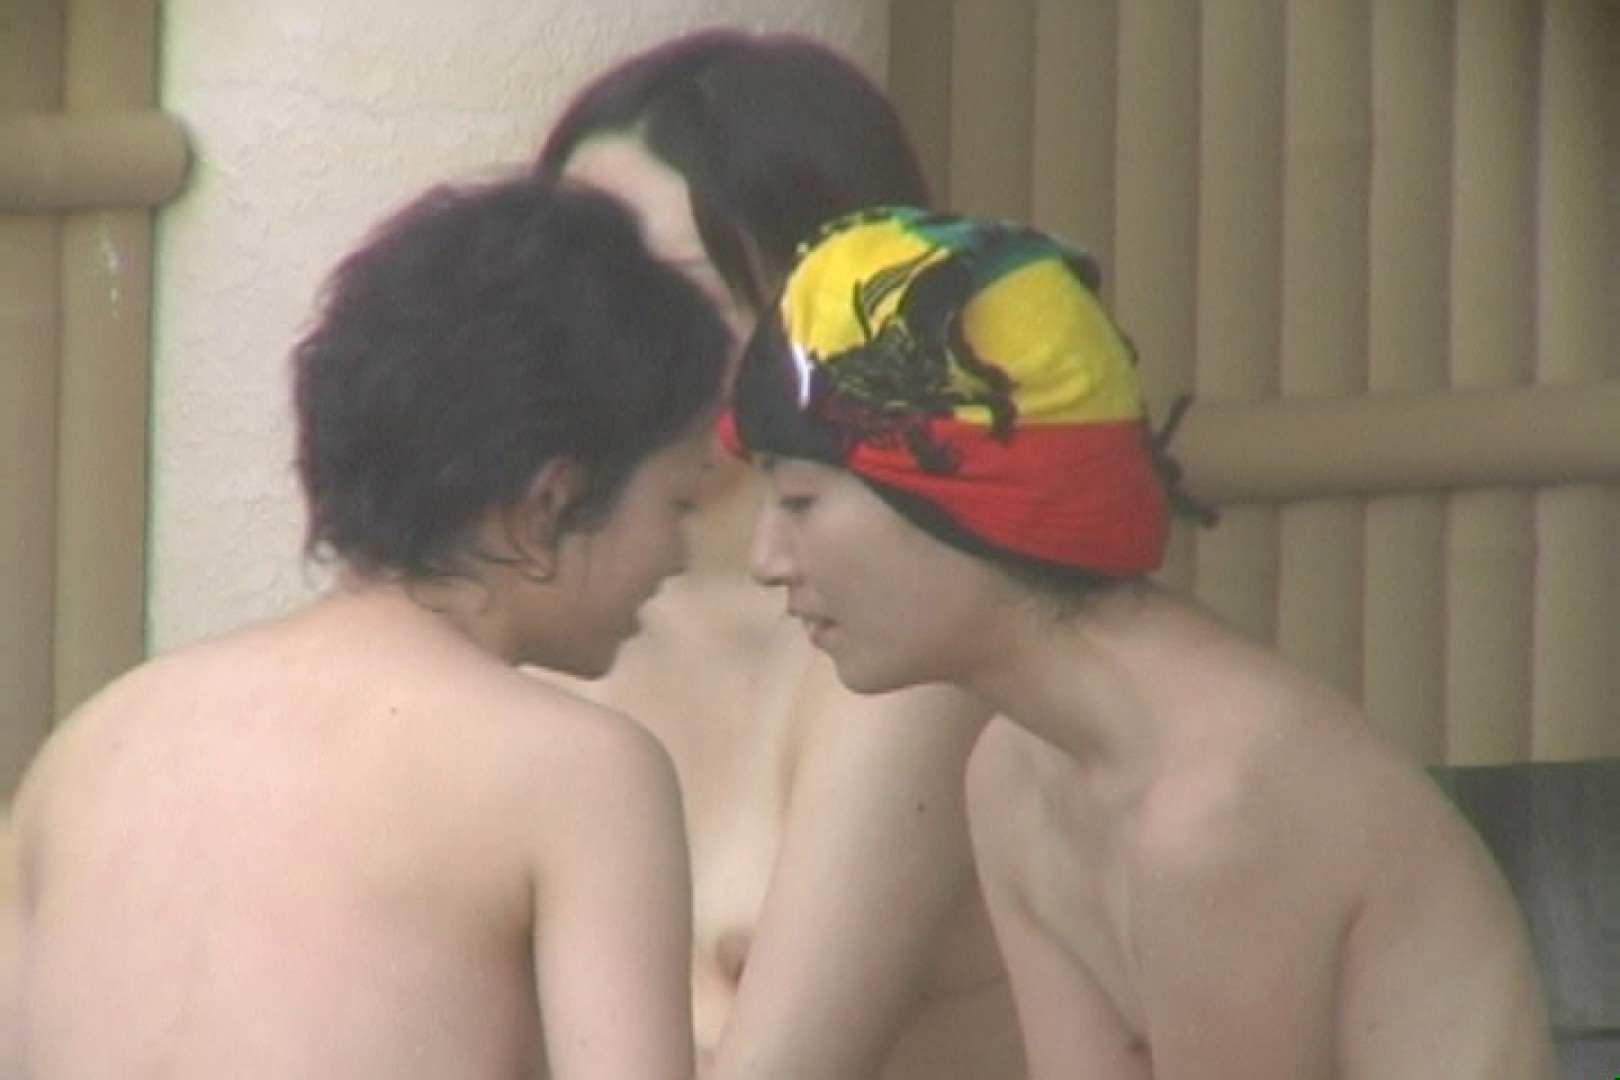 Aquaな露天風呂Vol.61【VIP限定】 露天風呂突入 隠し撮りオマンコ動画紹介 76pic 14